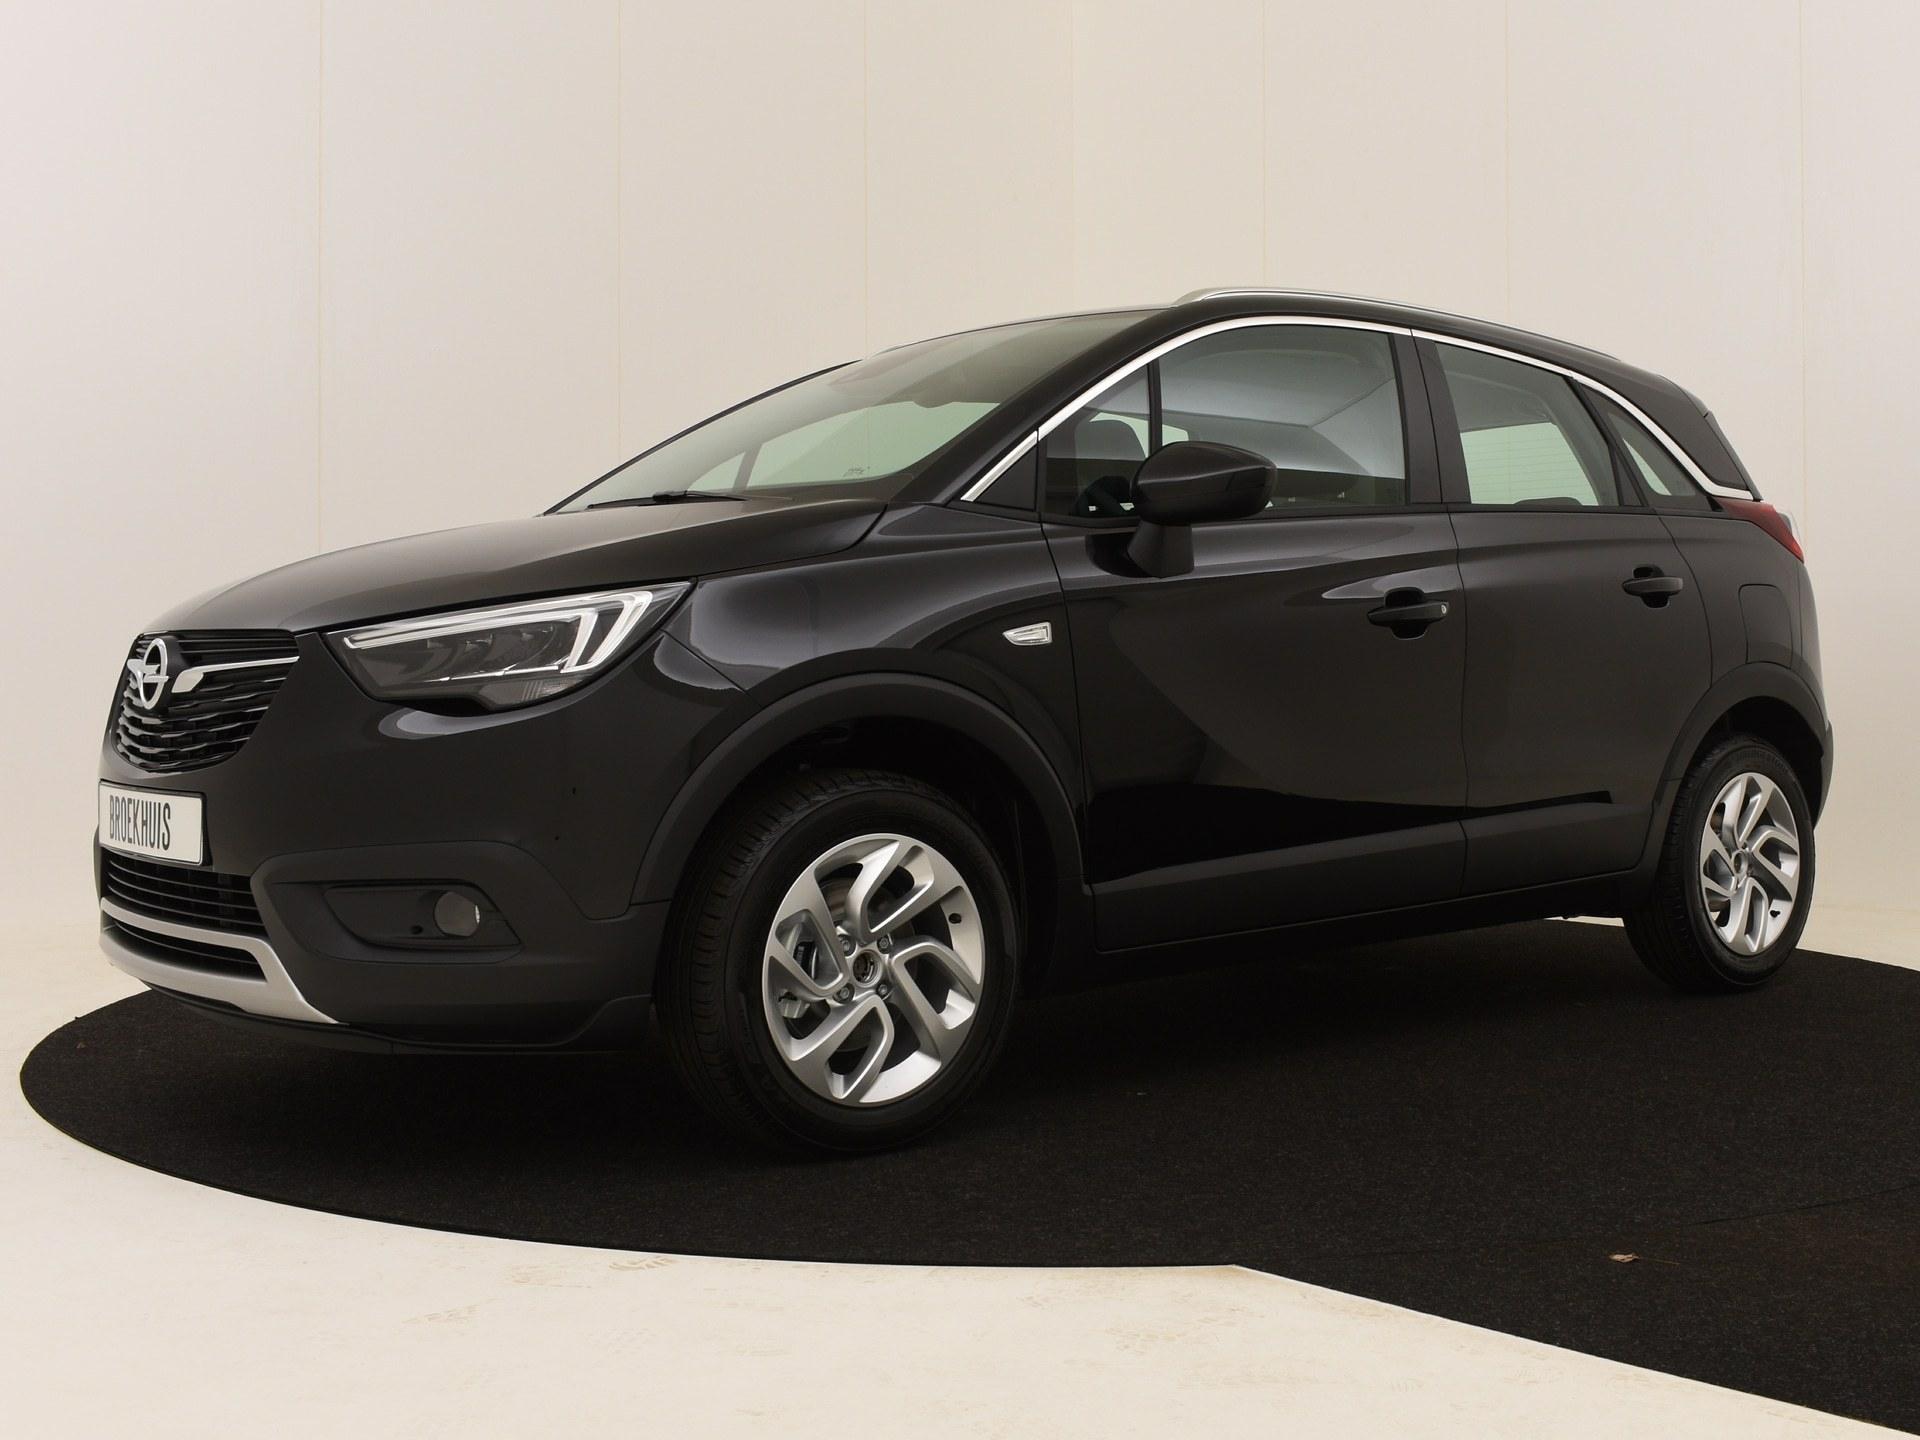 Opel Crossland X 1.2 Turbo 110 Pk Innovation inclusief navigatie